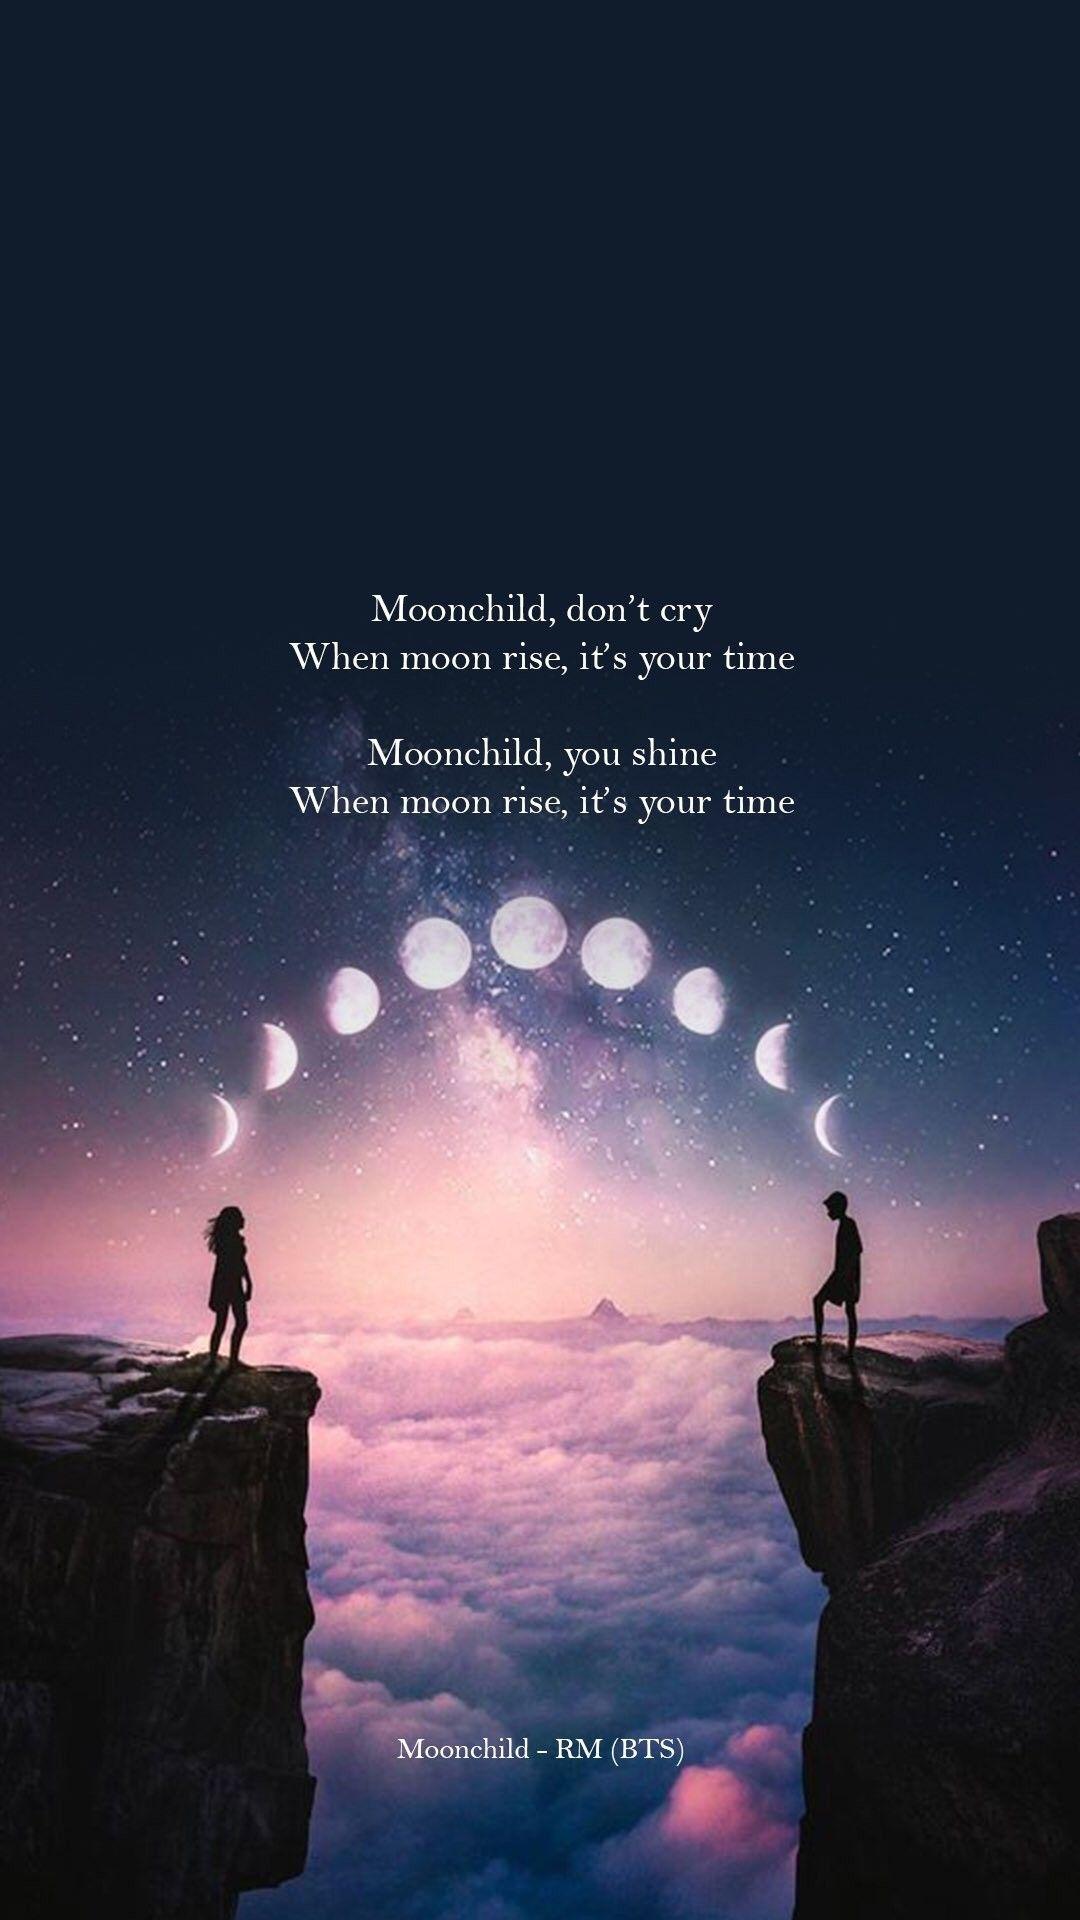 Rm Moonchild Bts Wallpaper Lyrics Bts Lyrics Quotes Bts Song Lyrics Bts inspirational quotes wallpaper